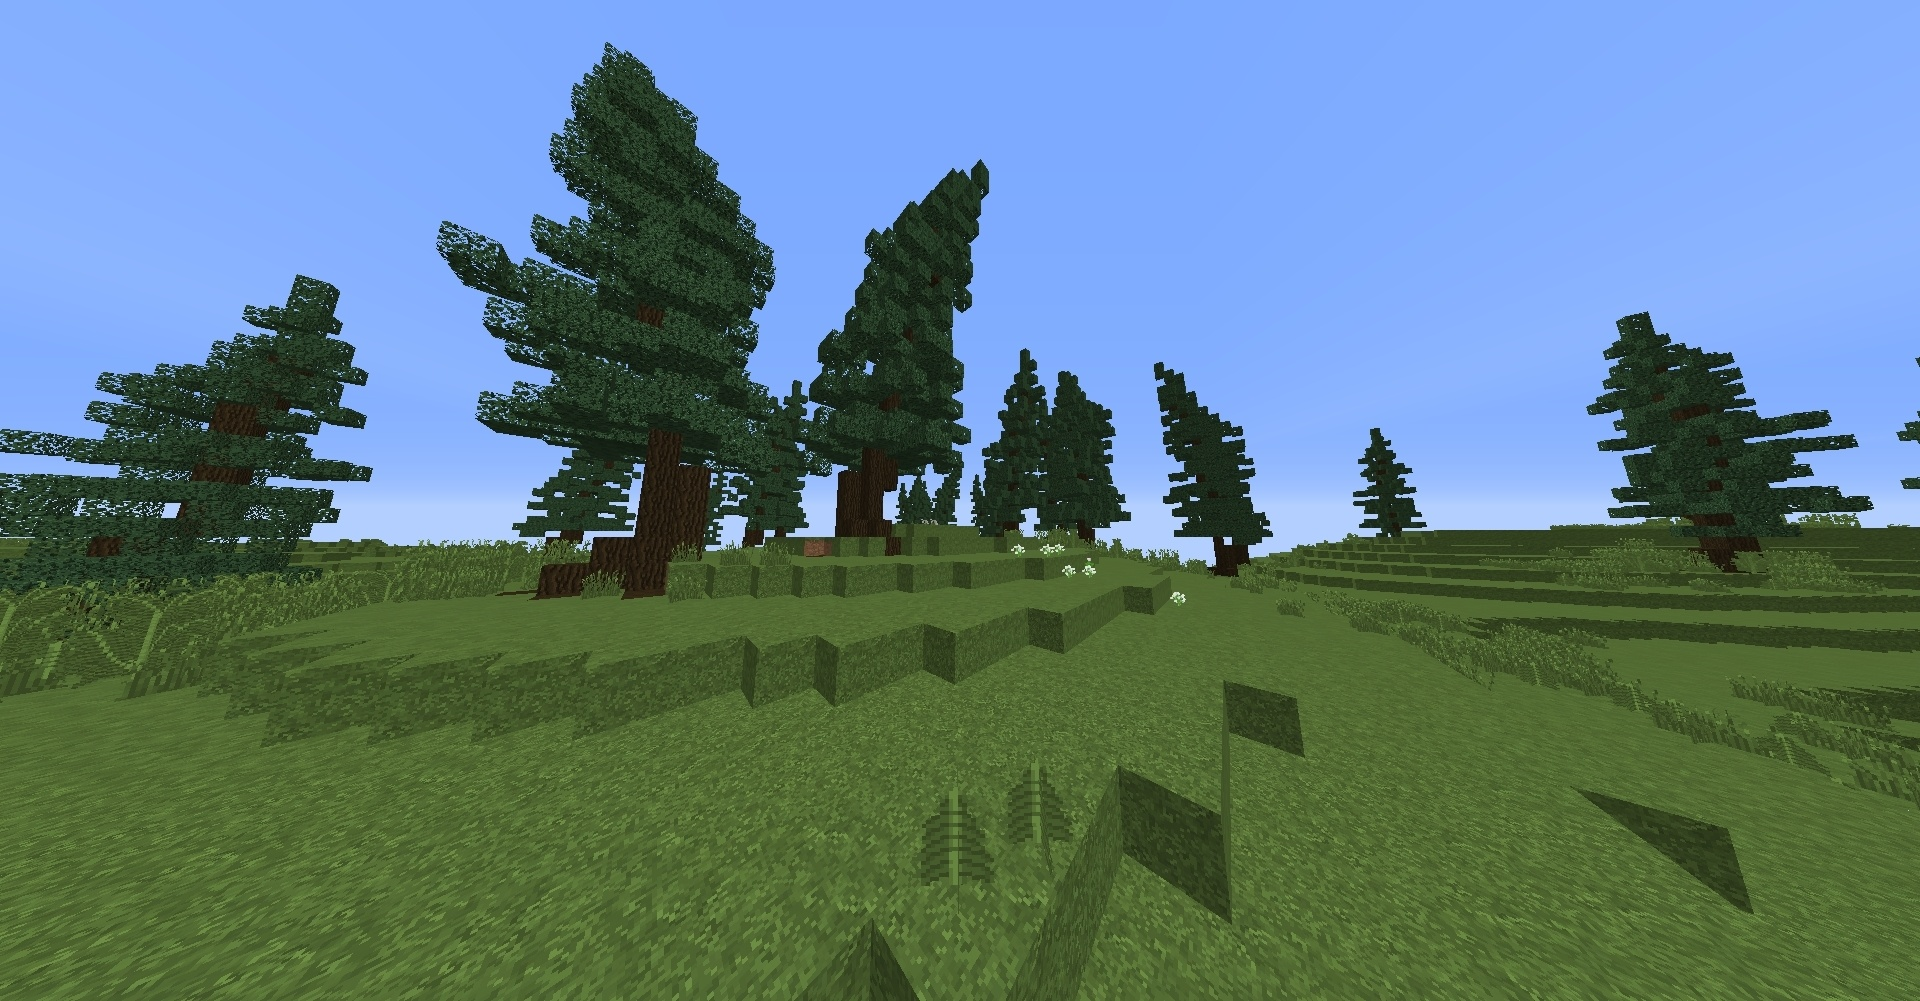 Custom Minecraft terrain - 6kx6k Map